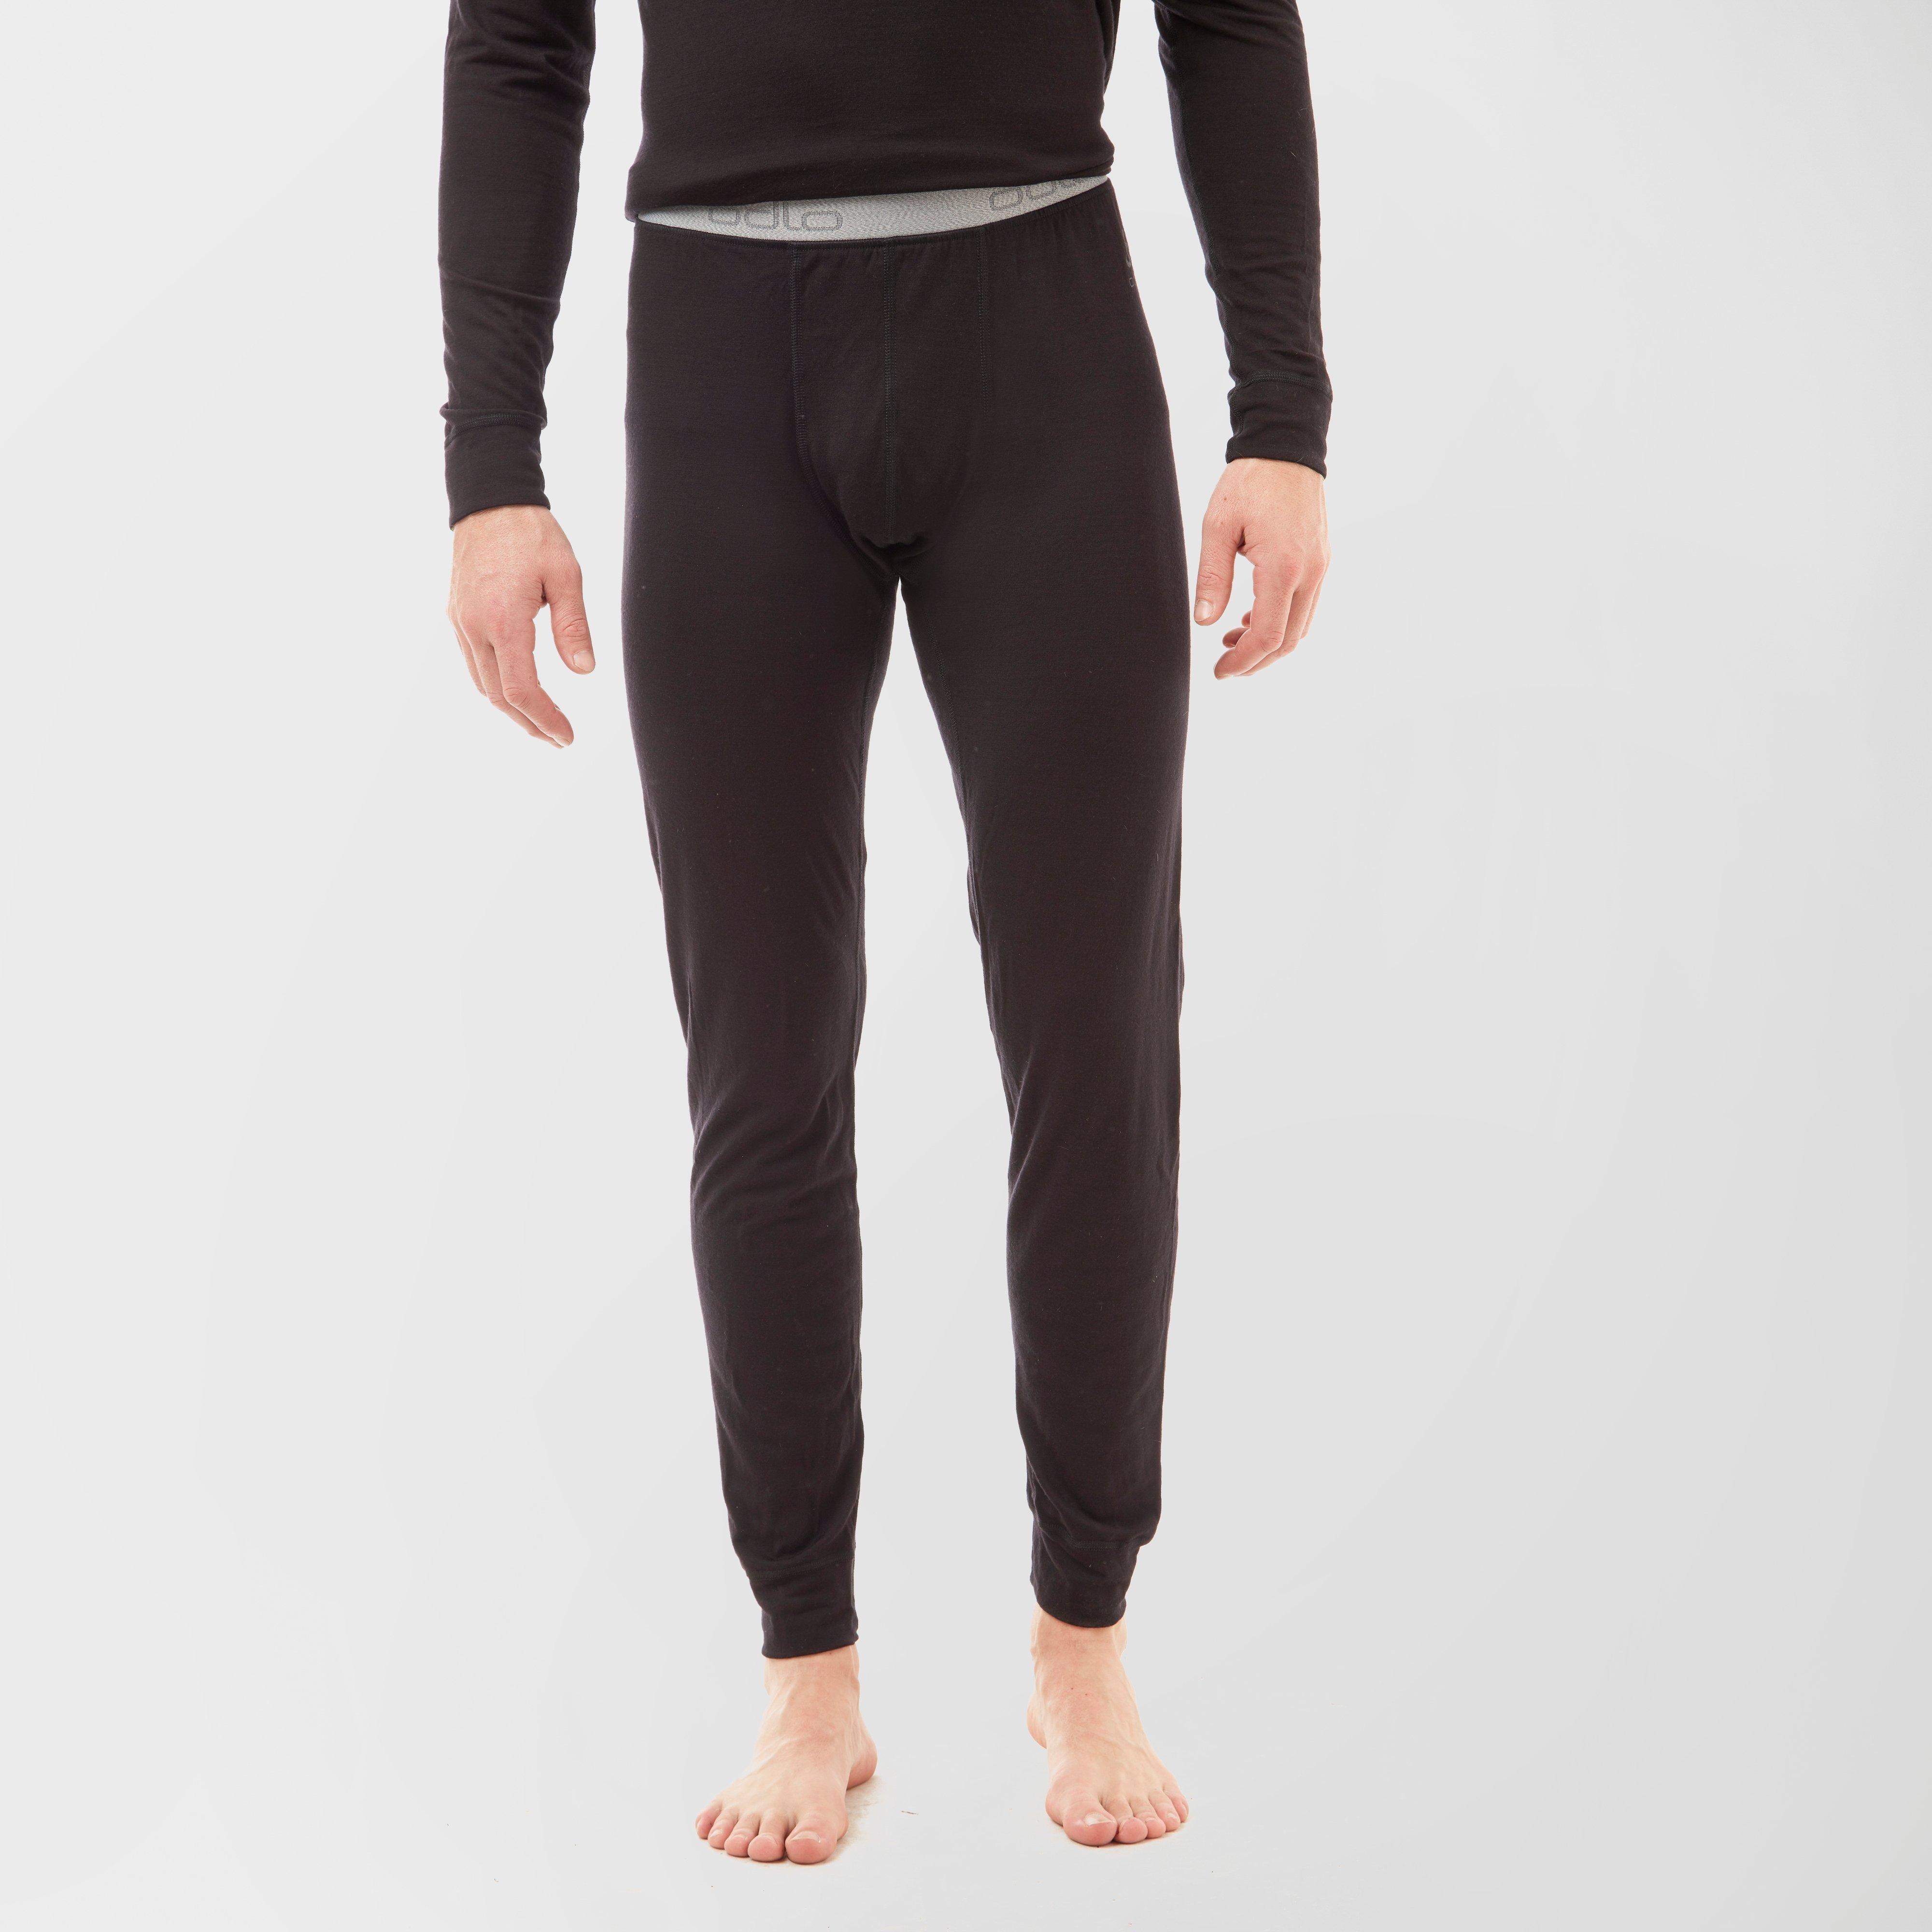 Odlo Mens Merino Warm Pants - Black/blk  Black/blk